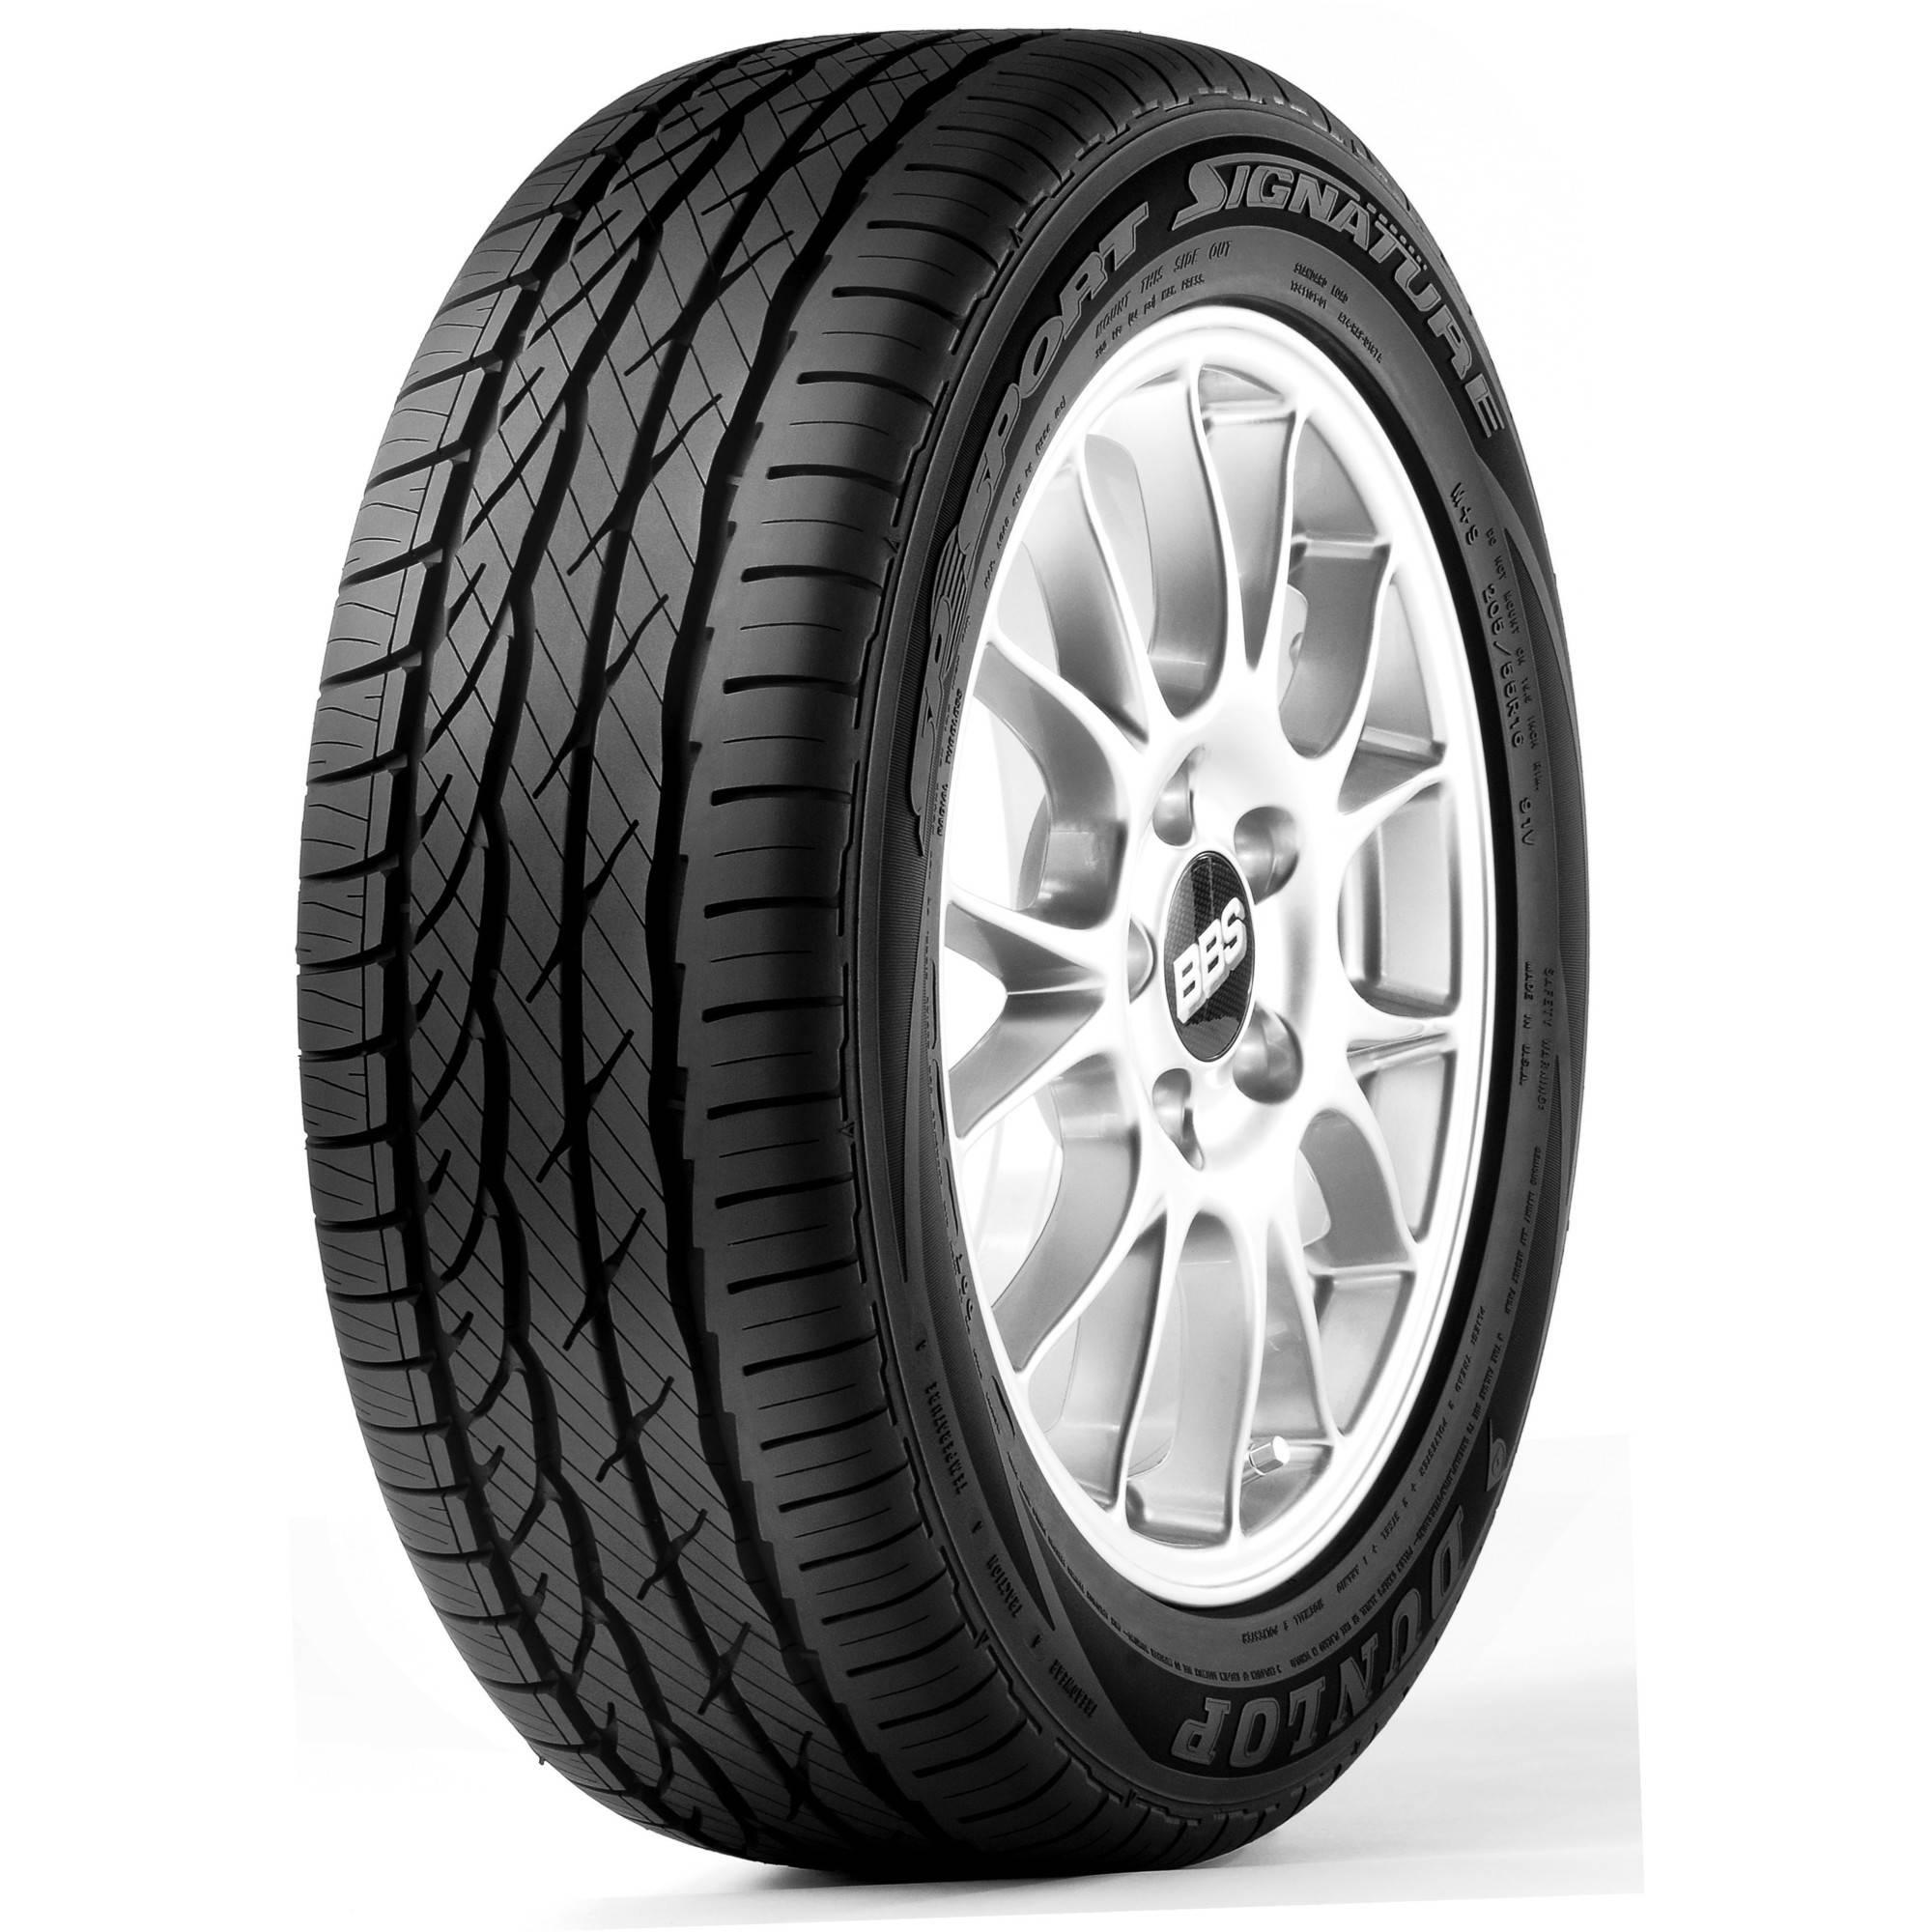 Dunlop SP Sport Signature Tire P205/60R16  91V